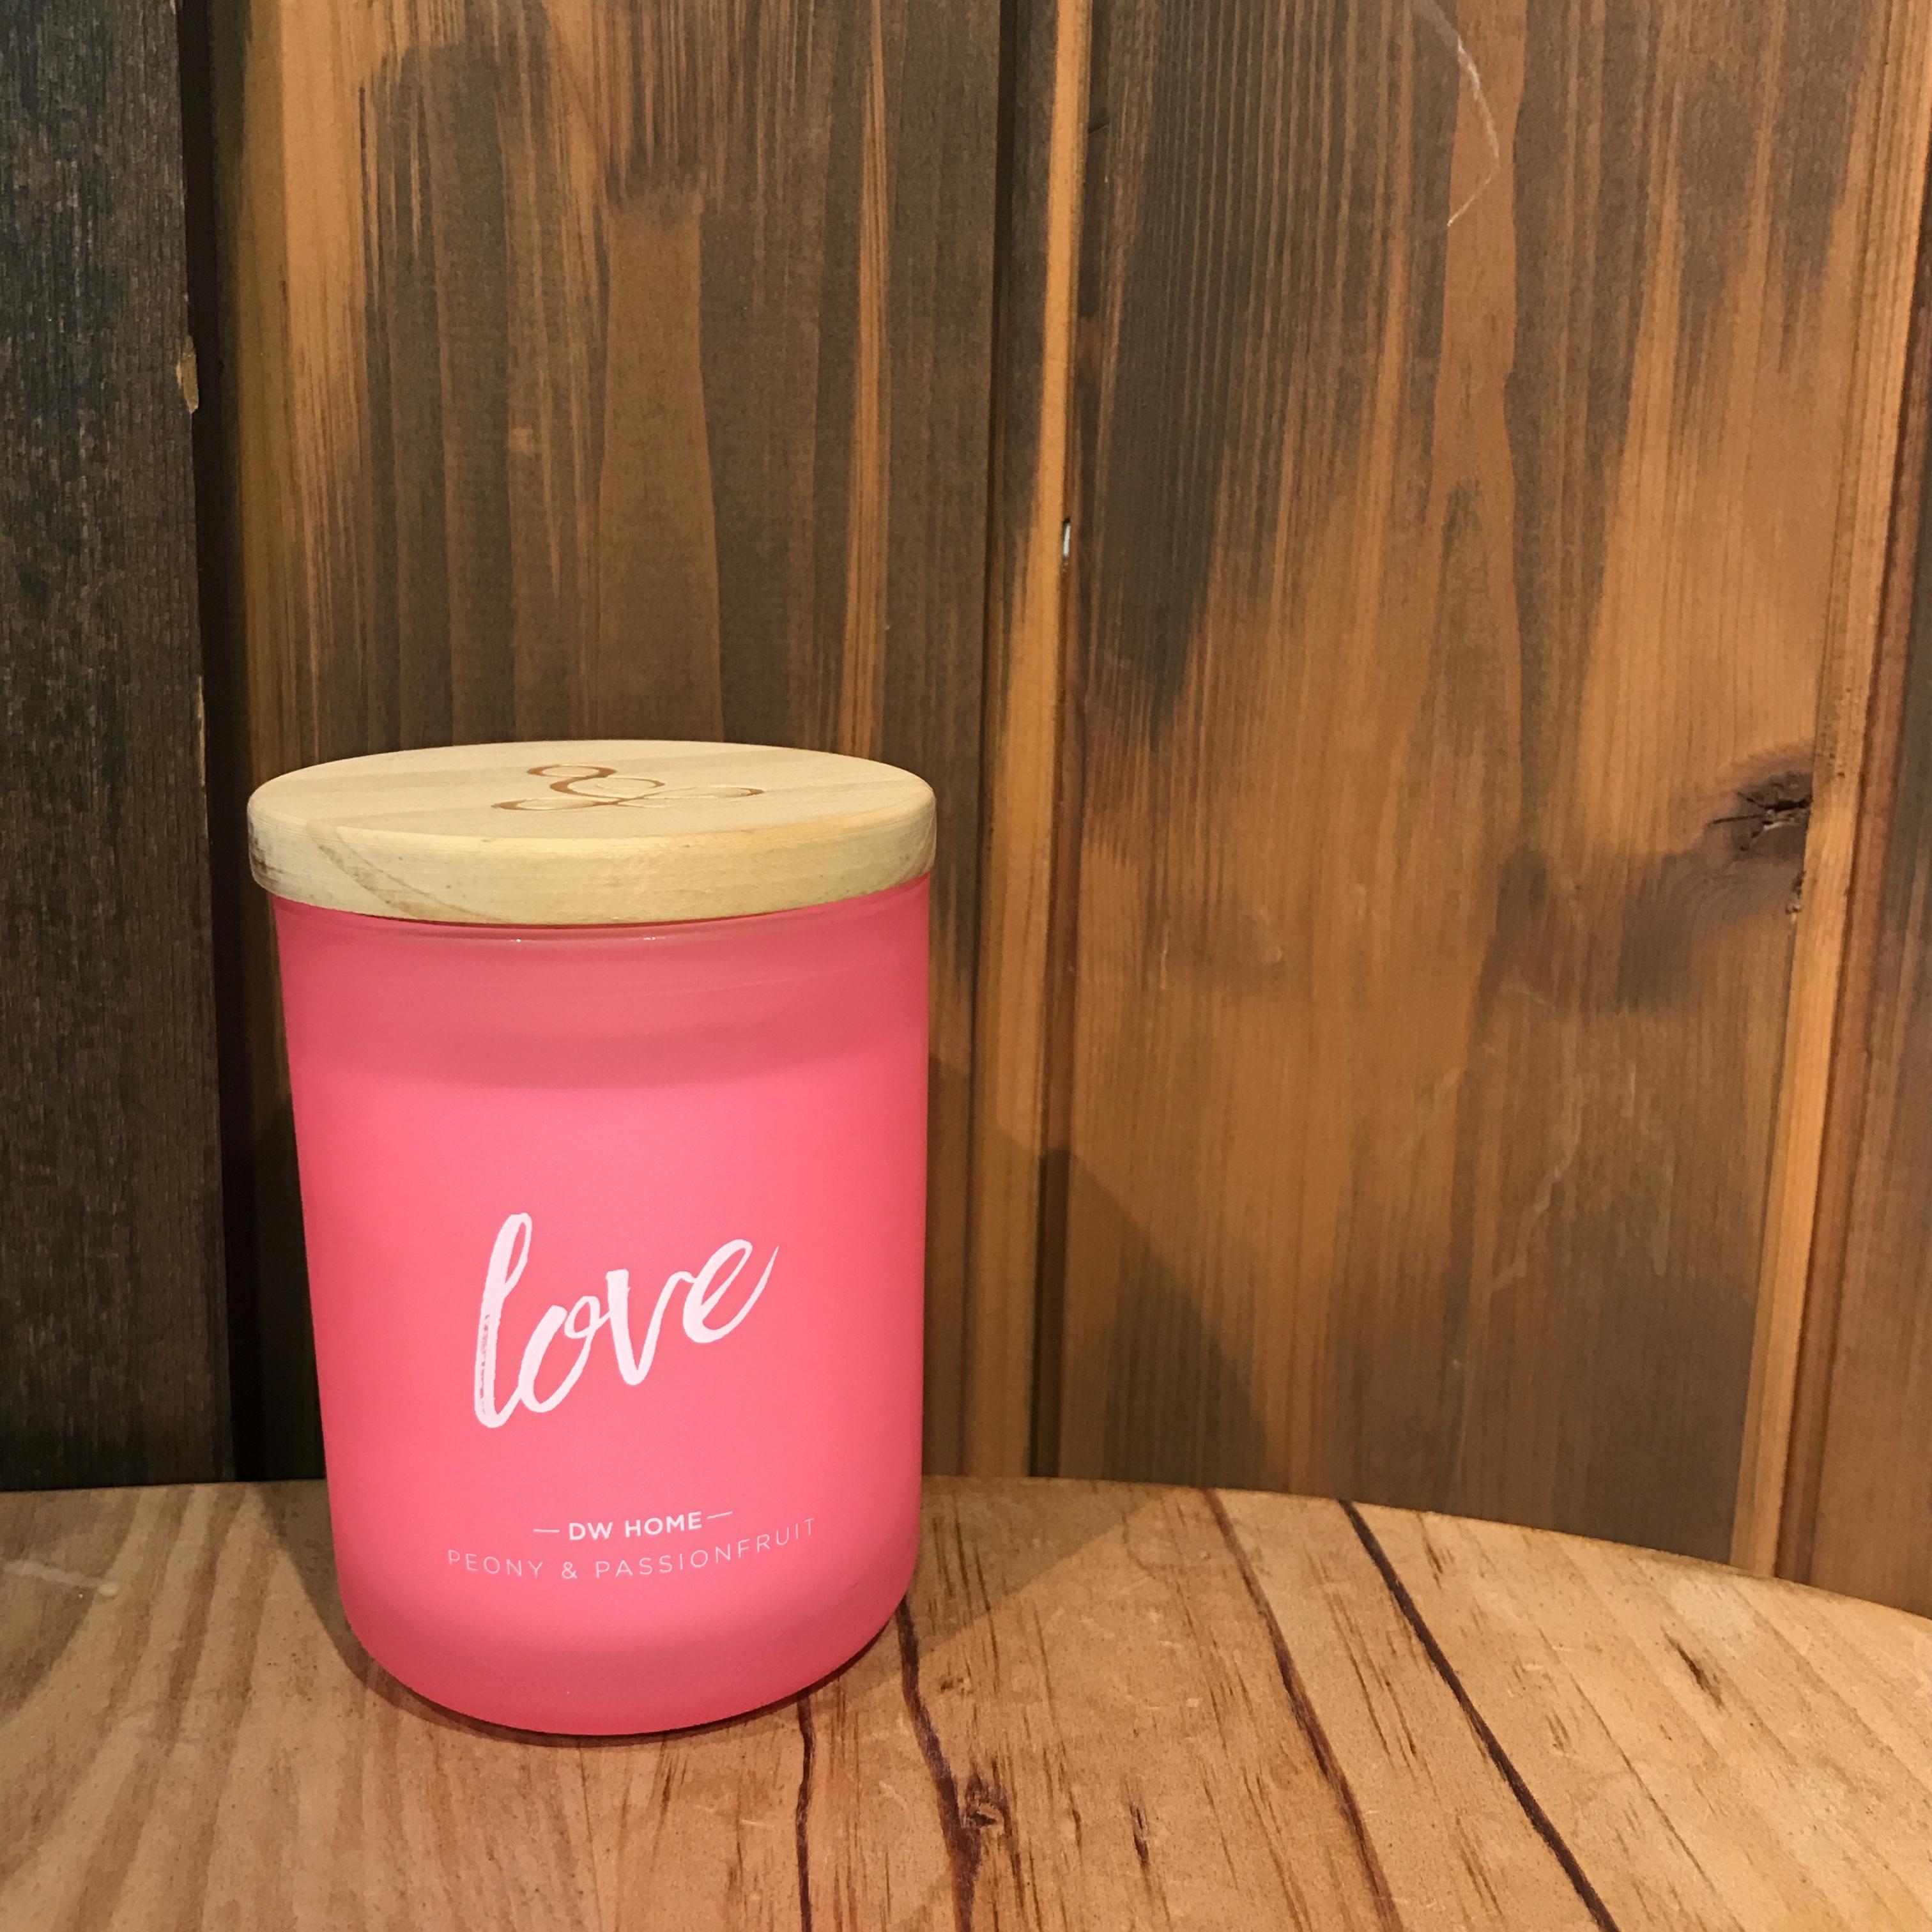 【DW Home Candles】love【アロマキャンドル】